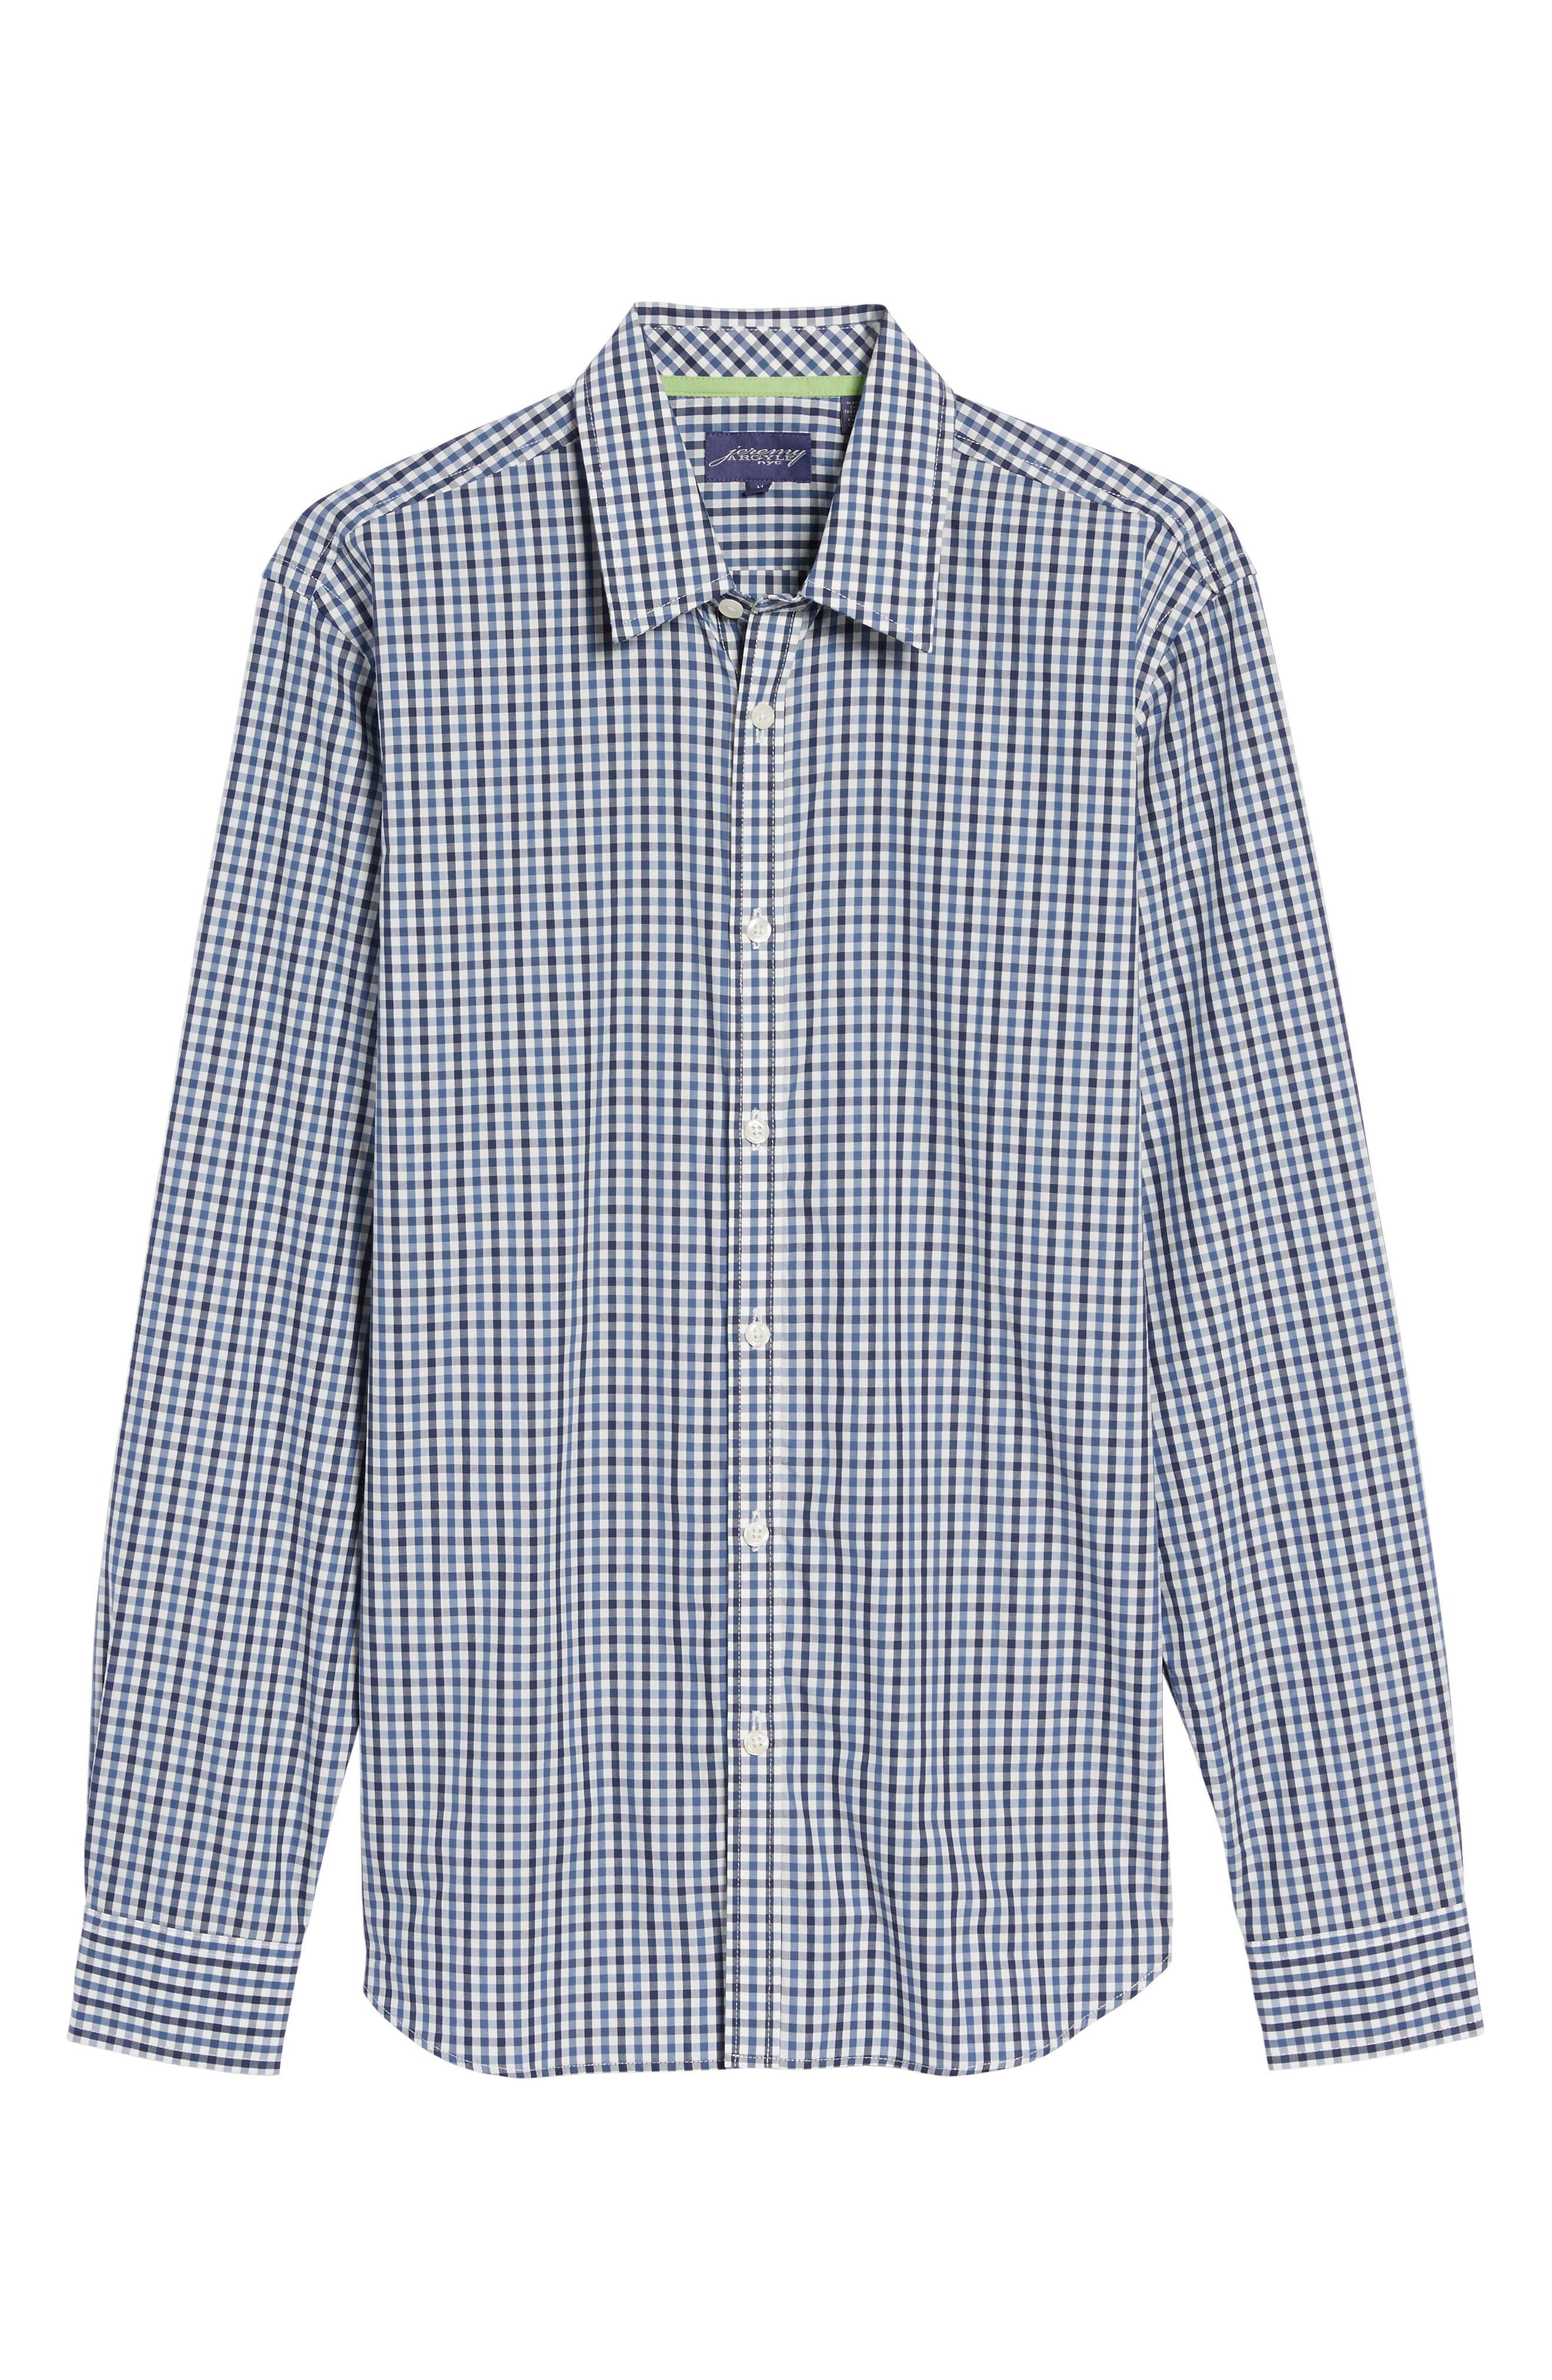 Comfort Fit Check Sport Shirt,                             Alternate thumbnail 6, color,                             424